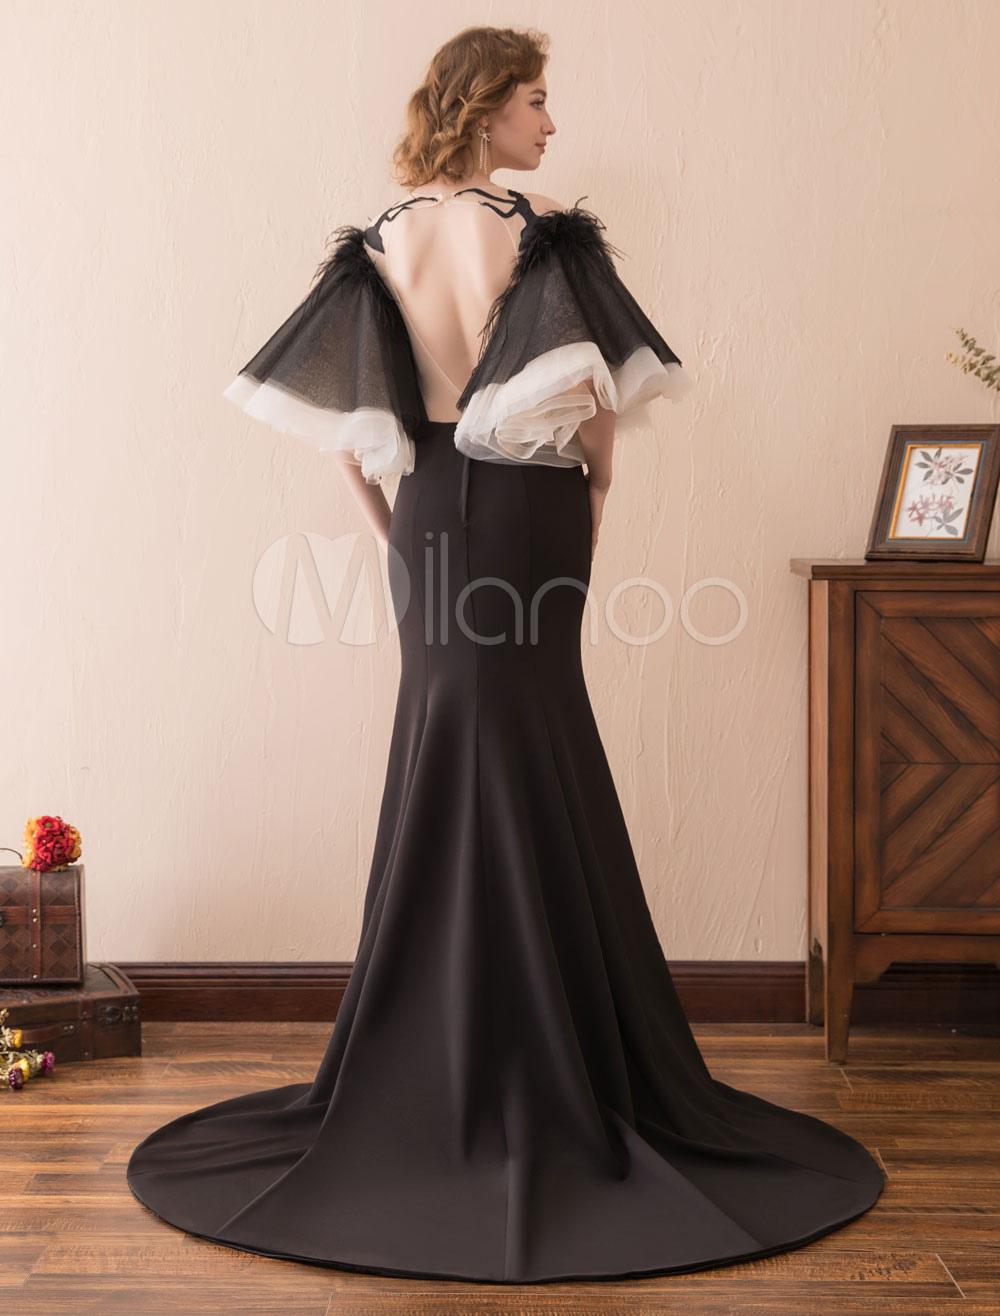 52223fb4457fd ... Black Evening Dresses Mermaid Long Prom Dress Bell Sleeve Ruffles Illusion  Satin Formal Dresses-No ...